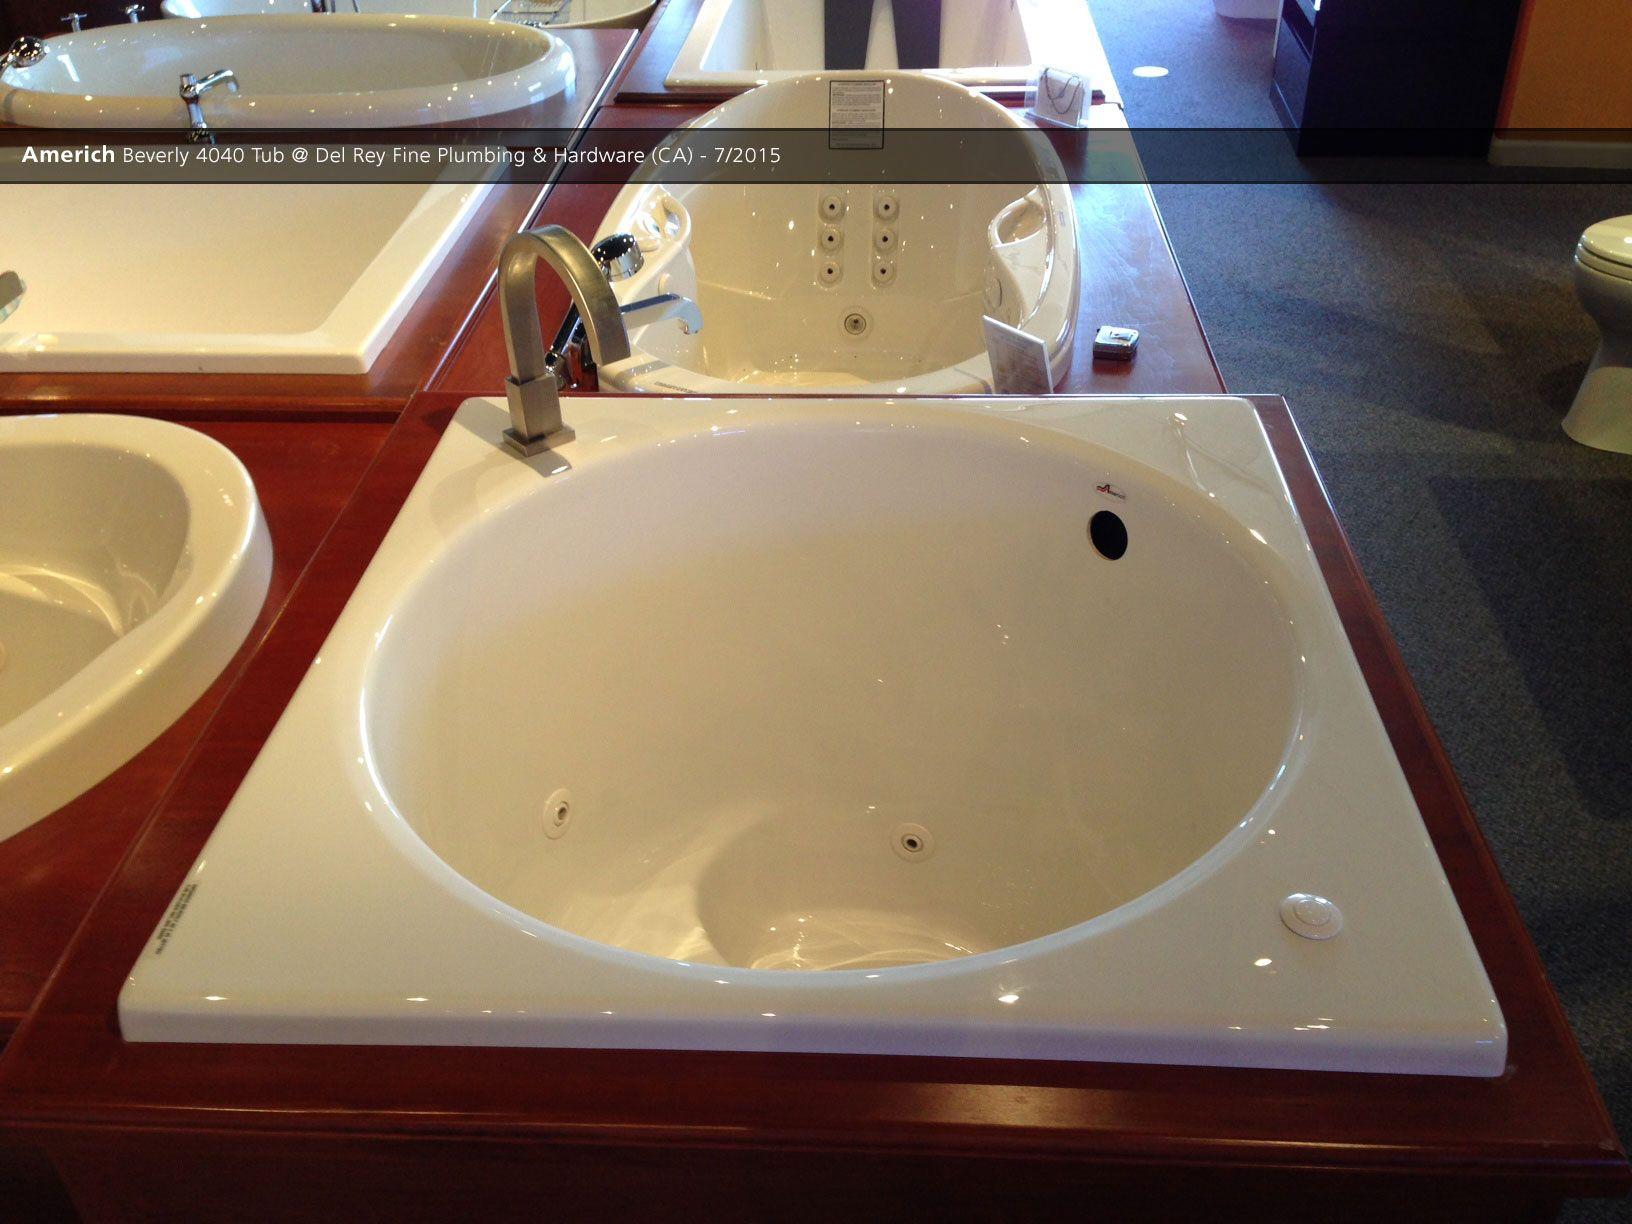 Bathroom Showrooms Torrance Ca americh beverly 4040 tub @ del rey fine plumbing & hardware (ca